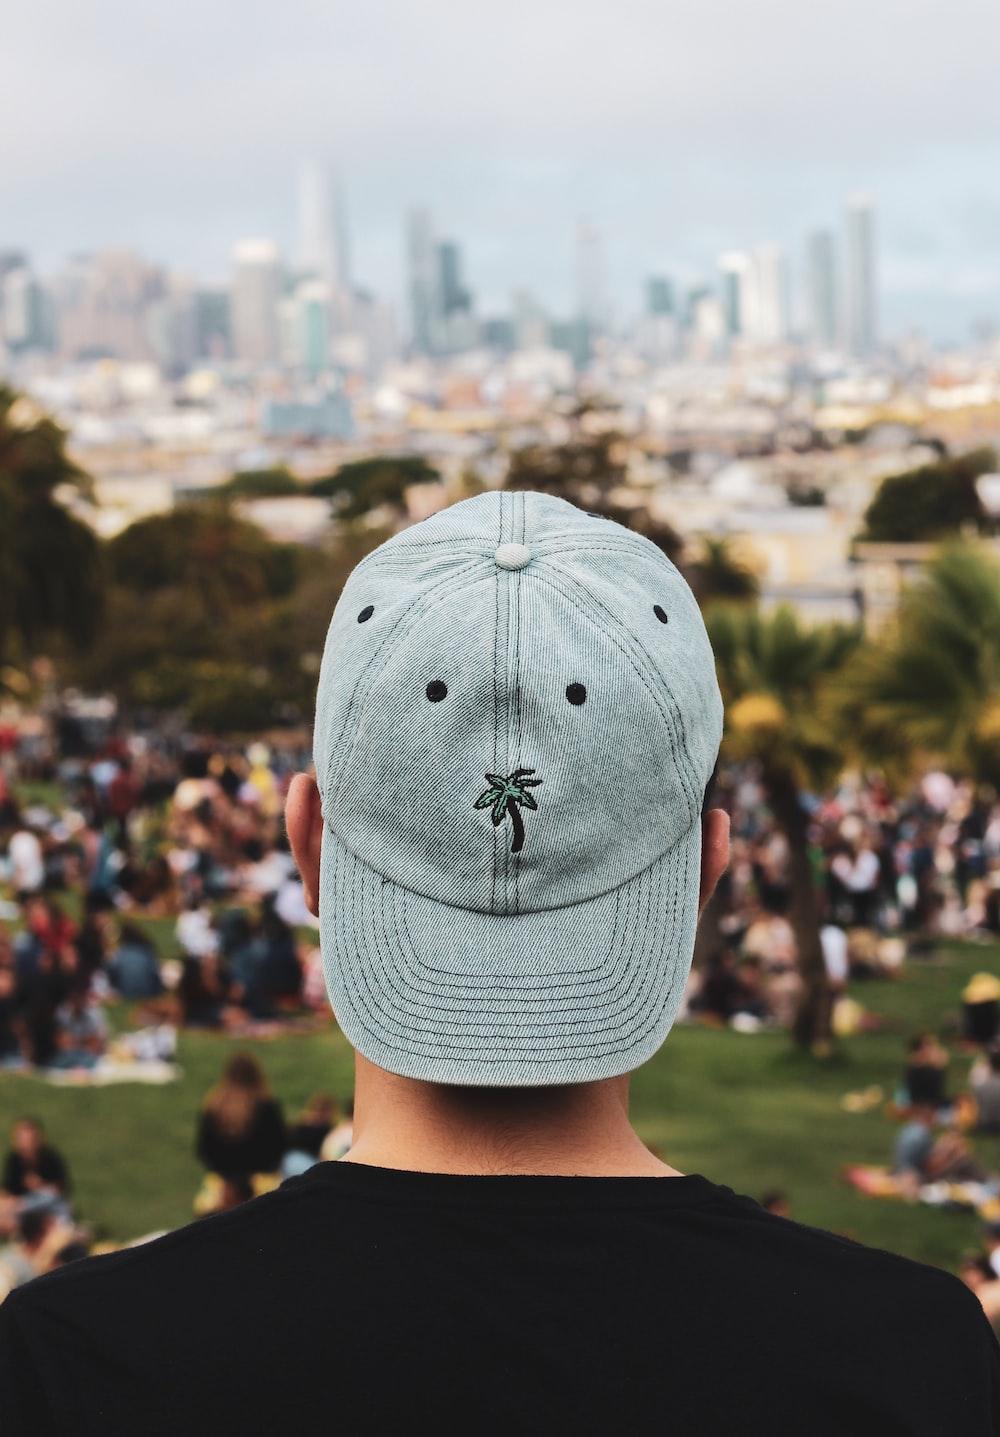 man in gray cap